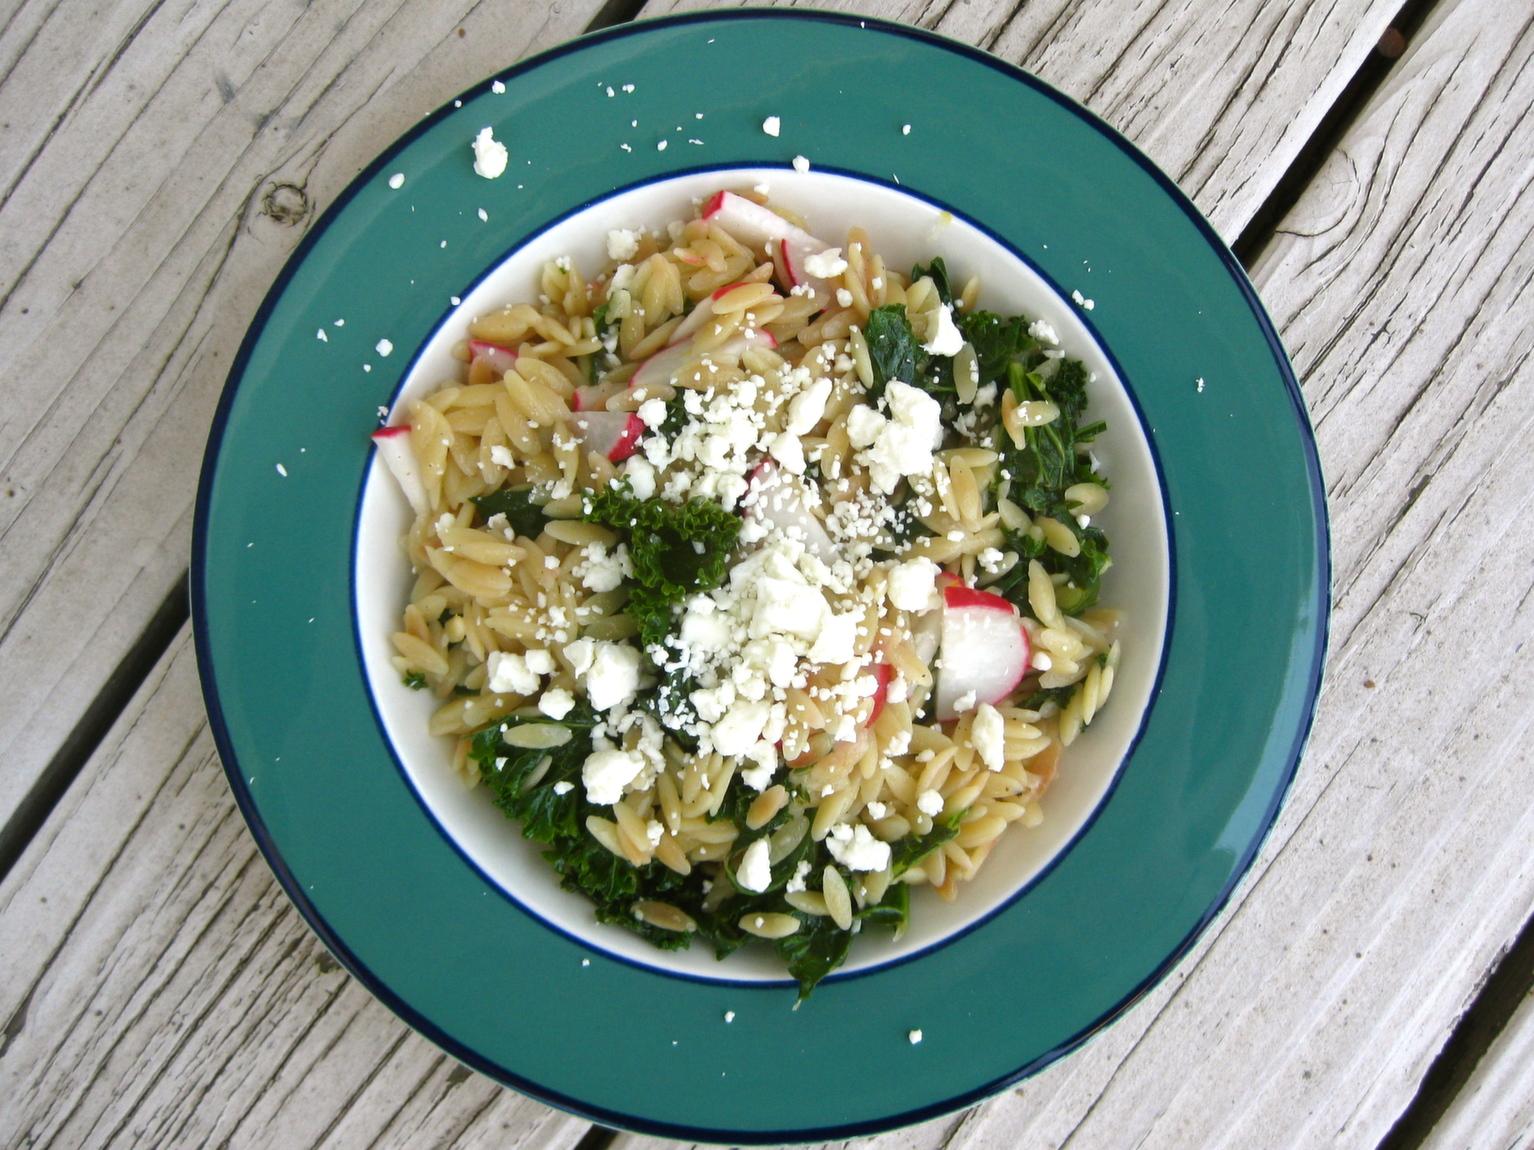 Toasted Orzo with Kale, Feta, and Radishes | spontaneous tomato